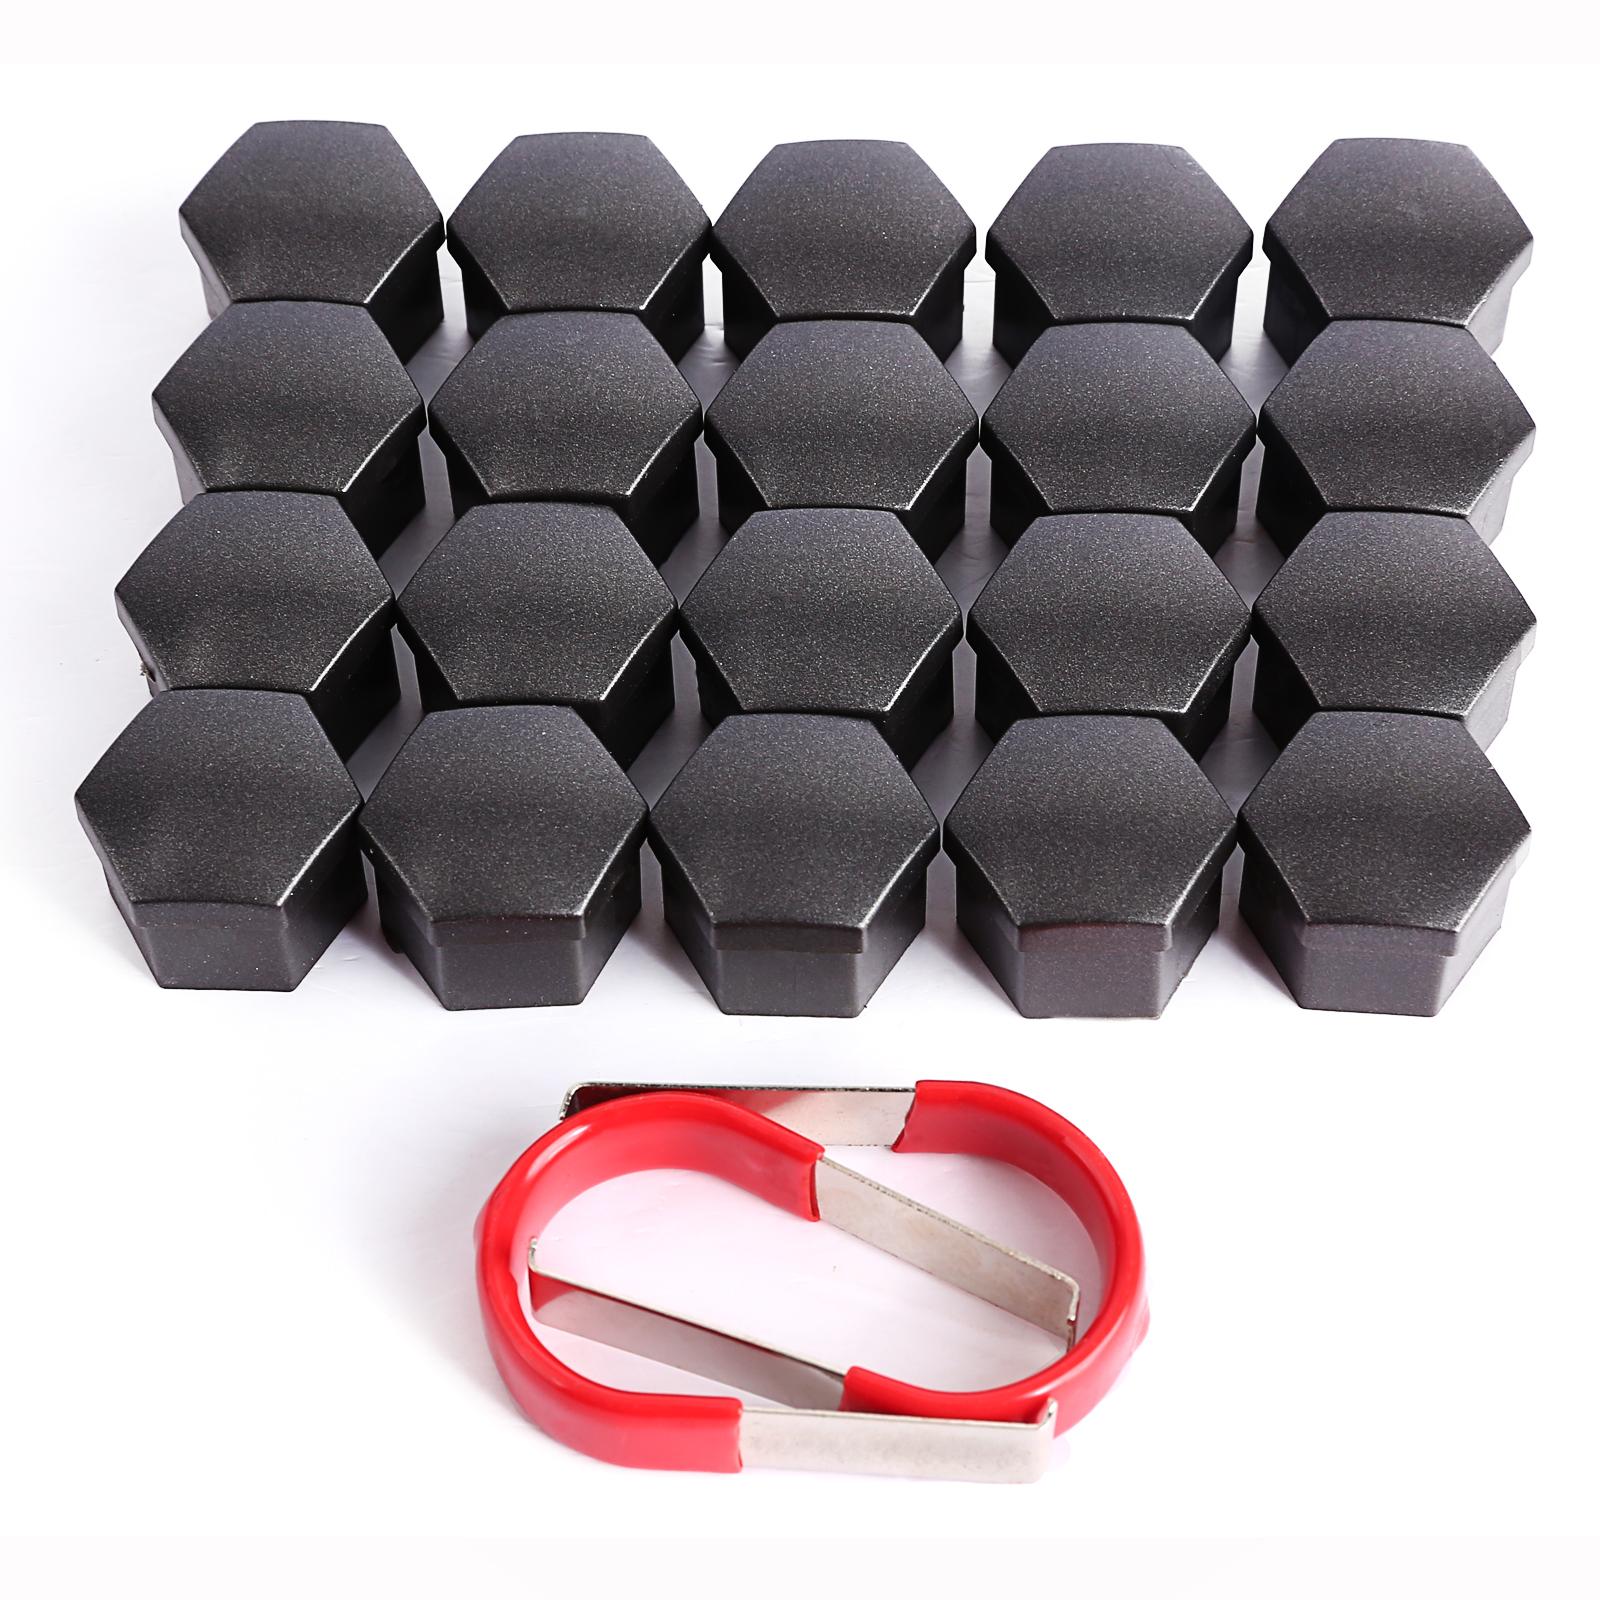 20 1 x Alloy Wheel Nut Caps Bolt Covers for Audi VW Vauxhall Bmw Plastic 19 mm